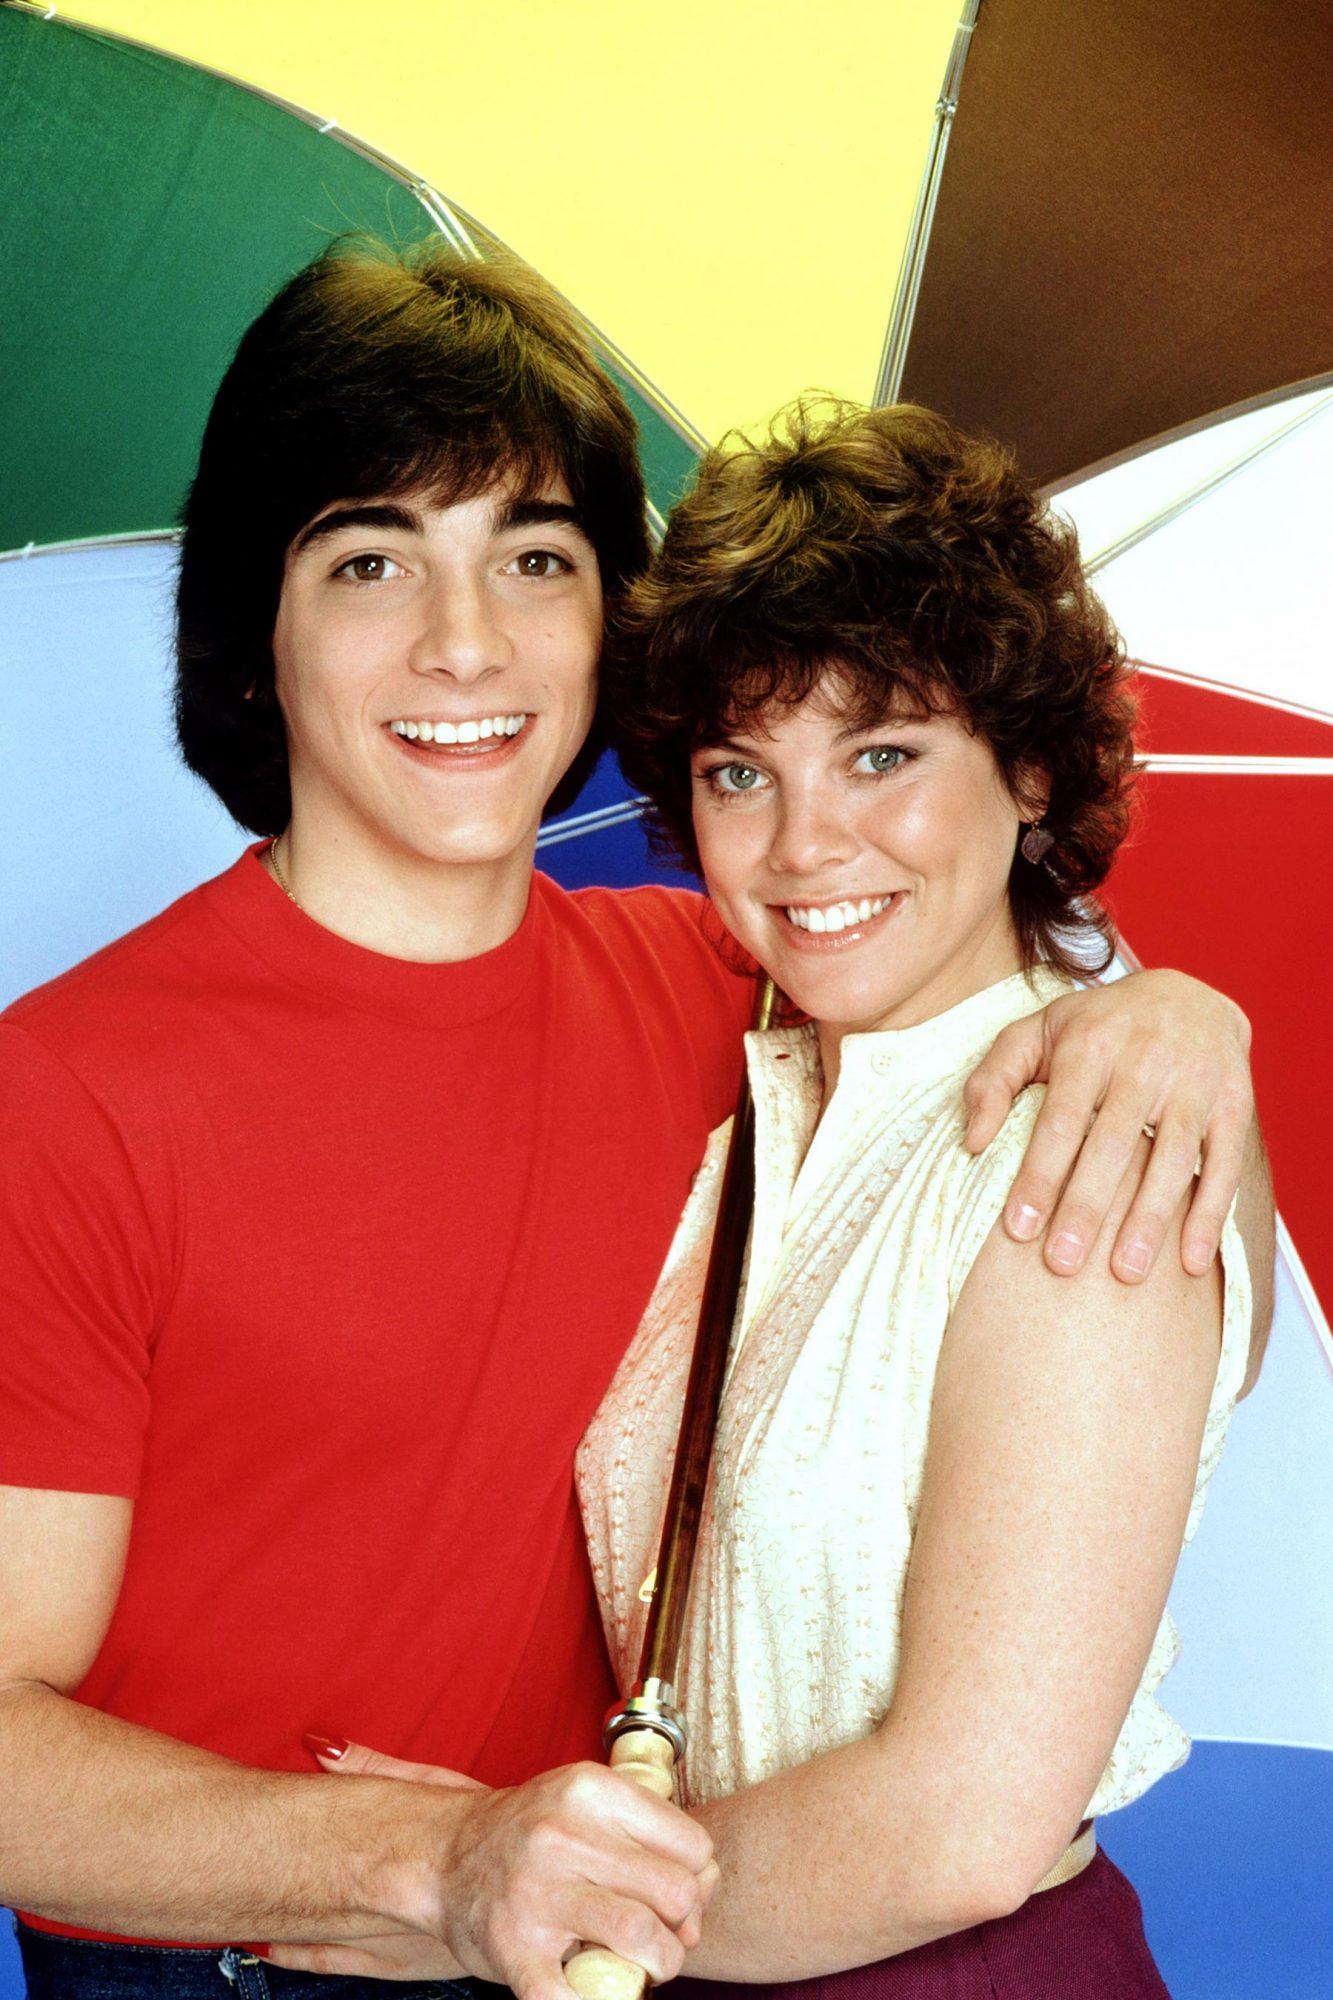 JOANIE LOVES CHACHI, Scott Baio, Erin Moran, 1982-83, © Paramount Television / Courtesy: Everett Col